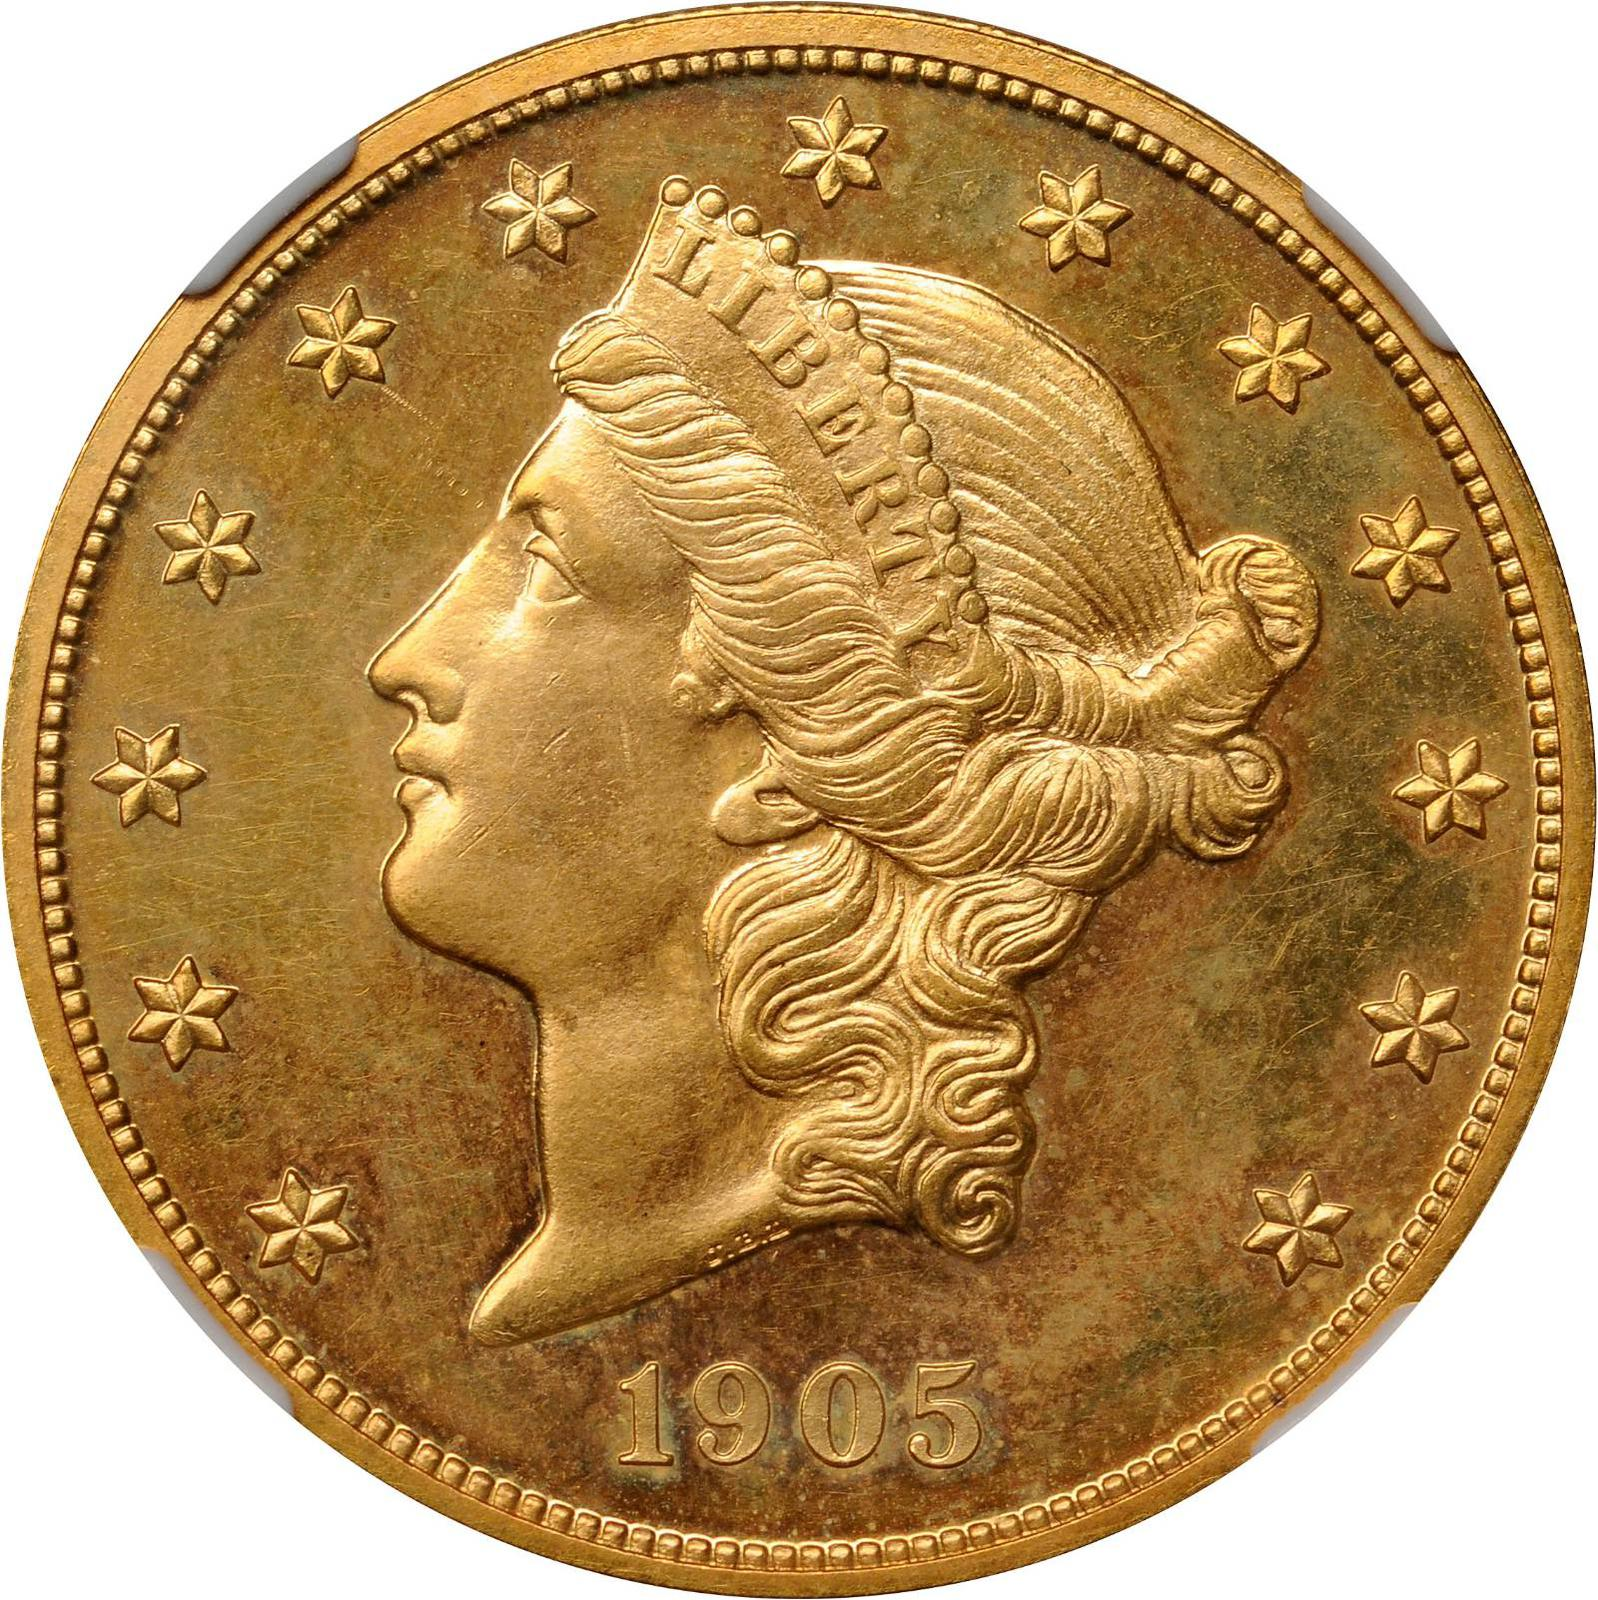 Value Of 1905 $20 Liberty Double Eagle